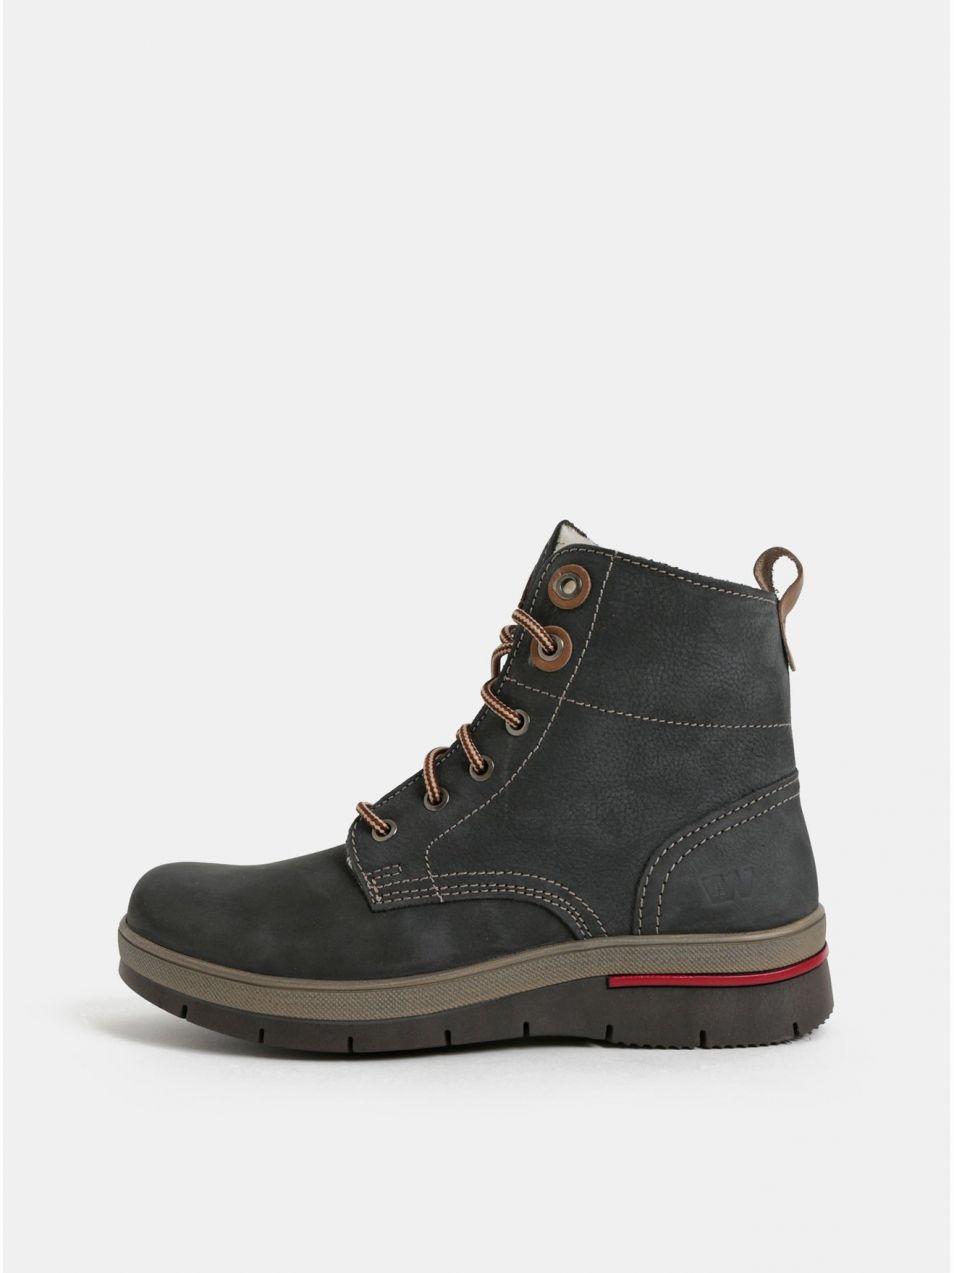 8b5c59e912 Tmavosivé dámske kožené členkové zimné topánky s umelou vnútornou kožušinkou  Weinbrenner značky Weinbrenner - Lovely.sk